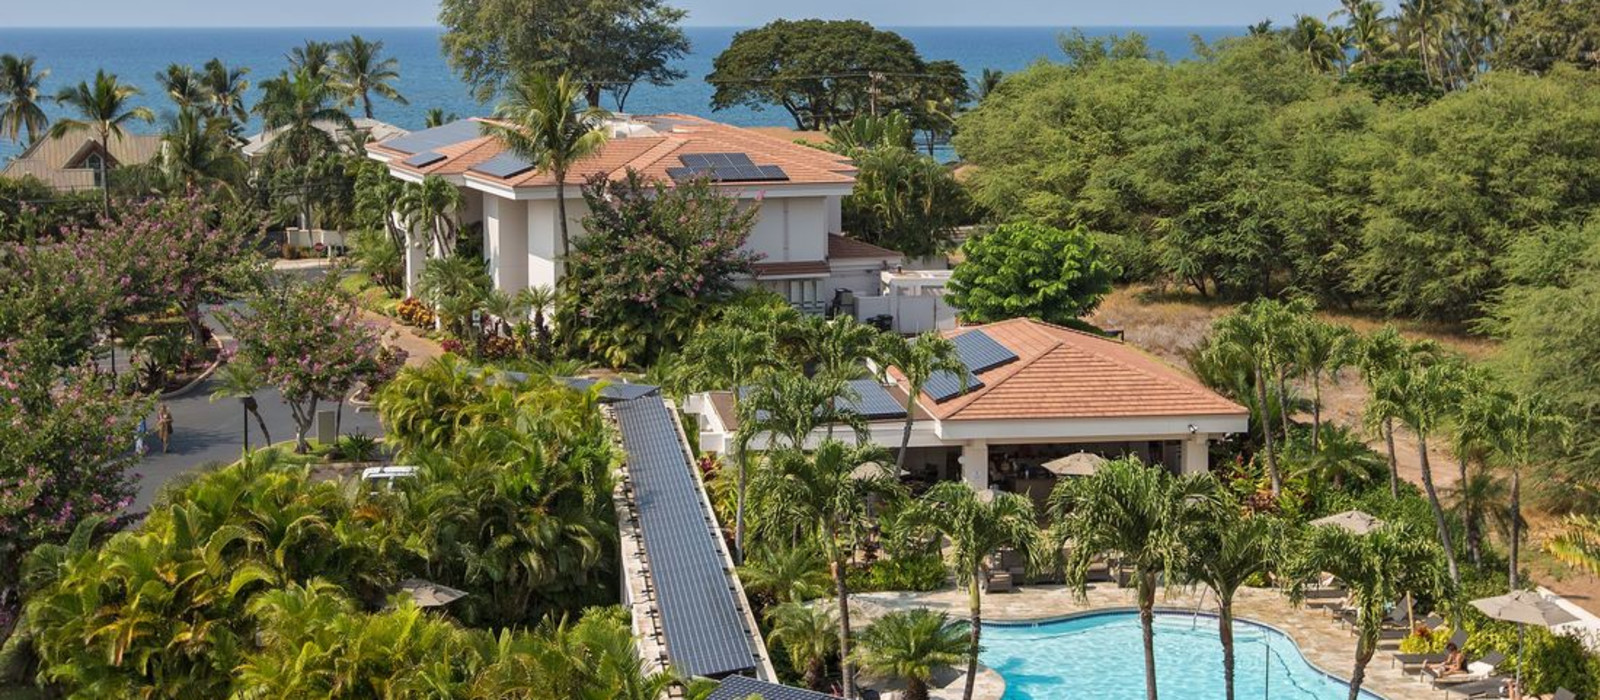 Hotel Maui Coast  Hawaii